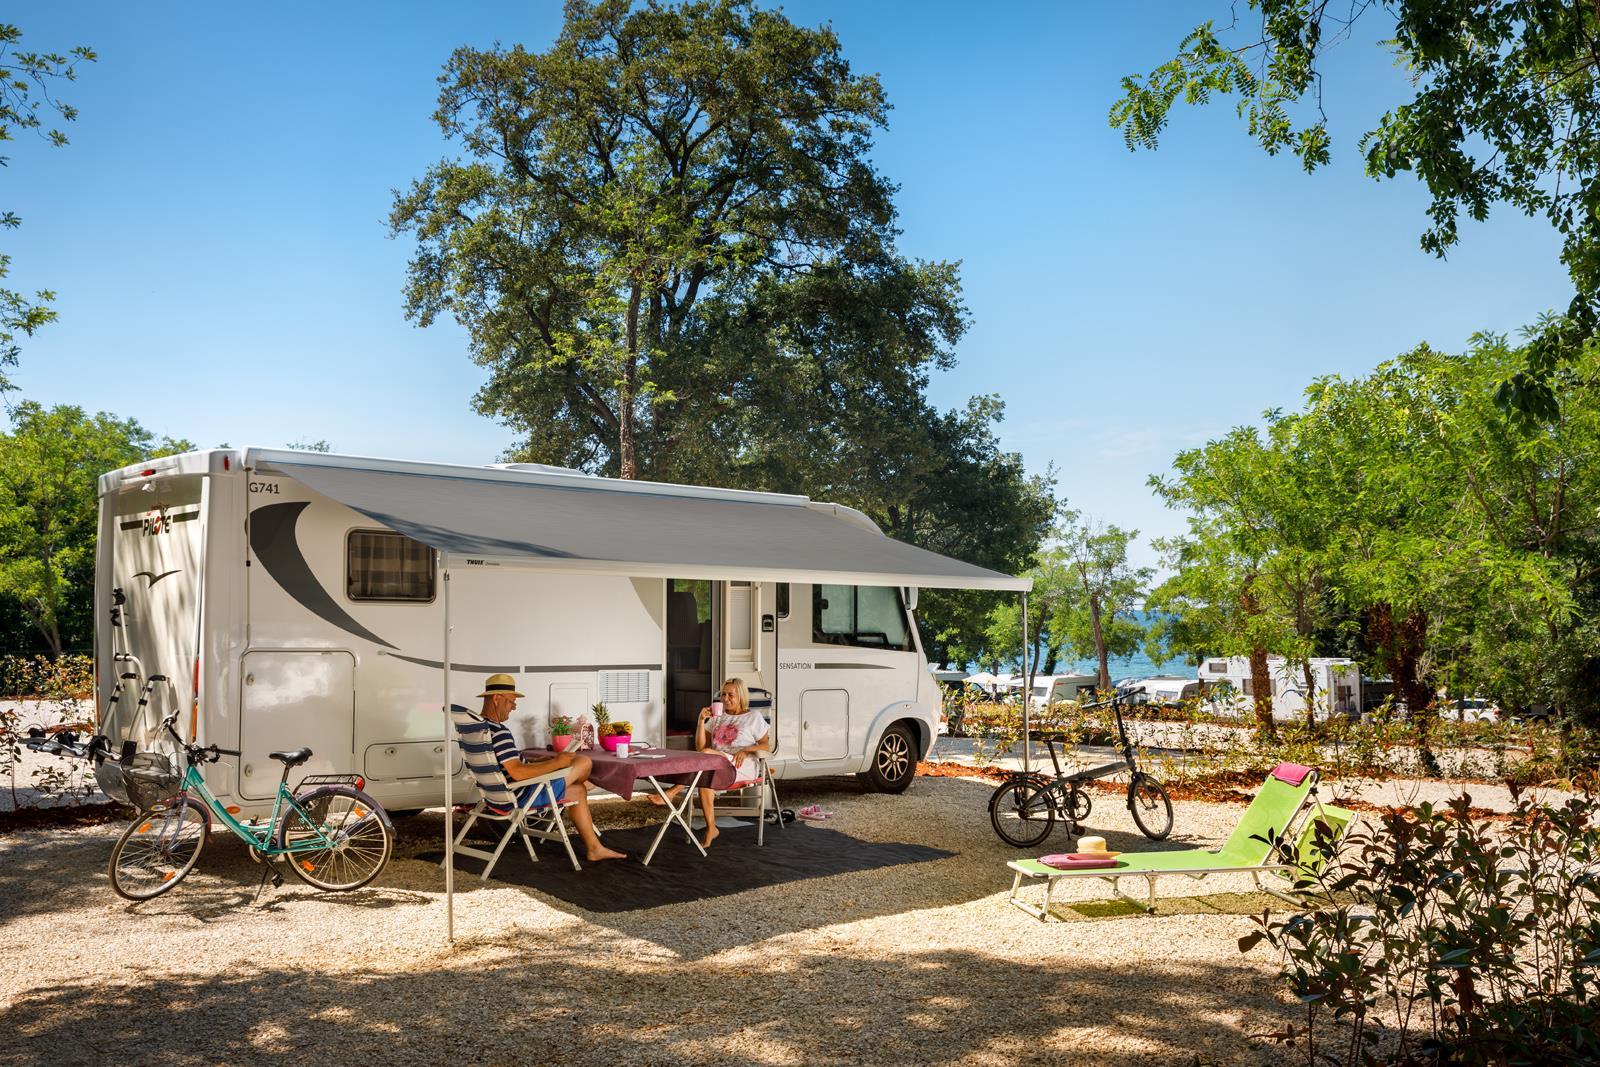 Emplacement - Emplacement Premium - Aminess Maravea Camping Resort